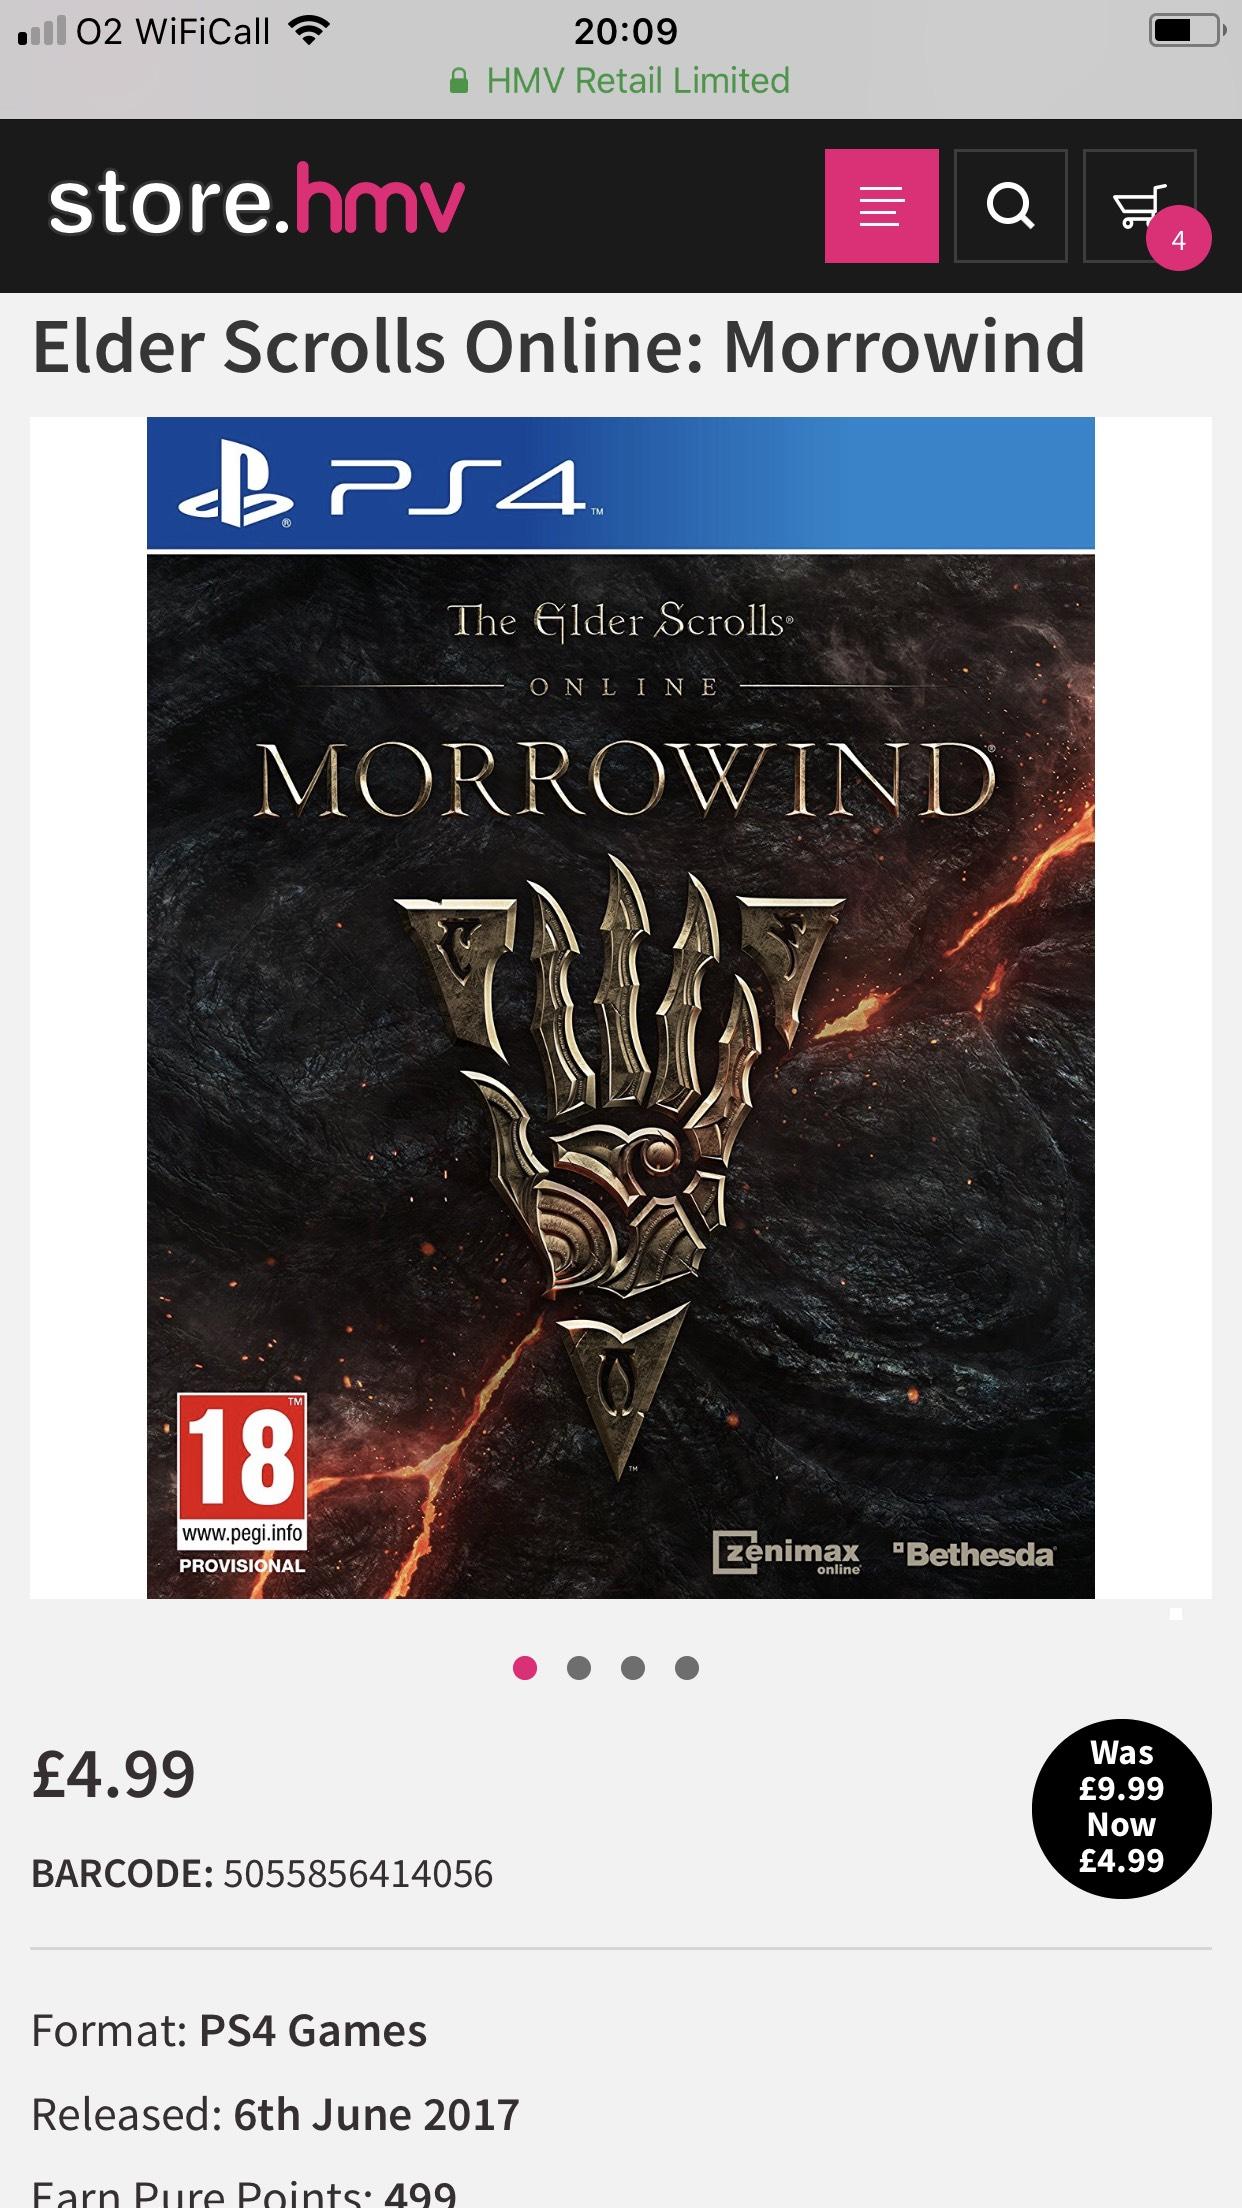 Elder Scrolls Online: Morrowind - £4.99 @ HMV (C&C)